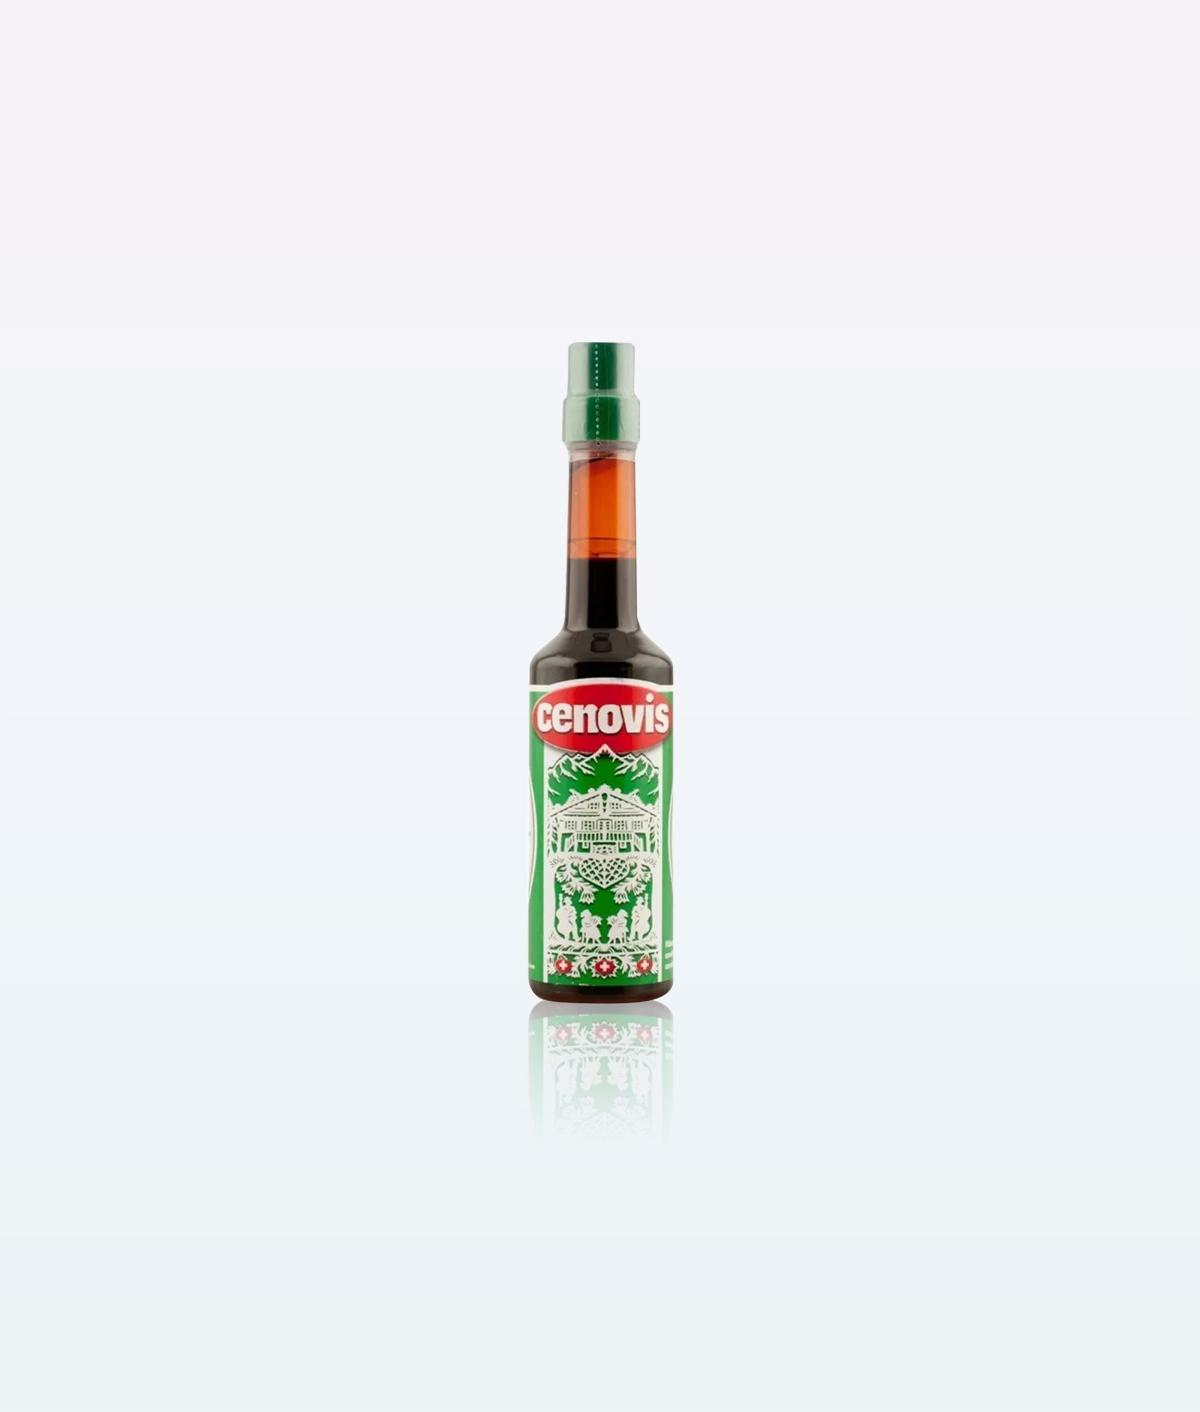 Cenovis-Liquid-Seasoning